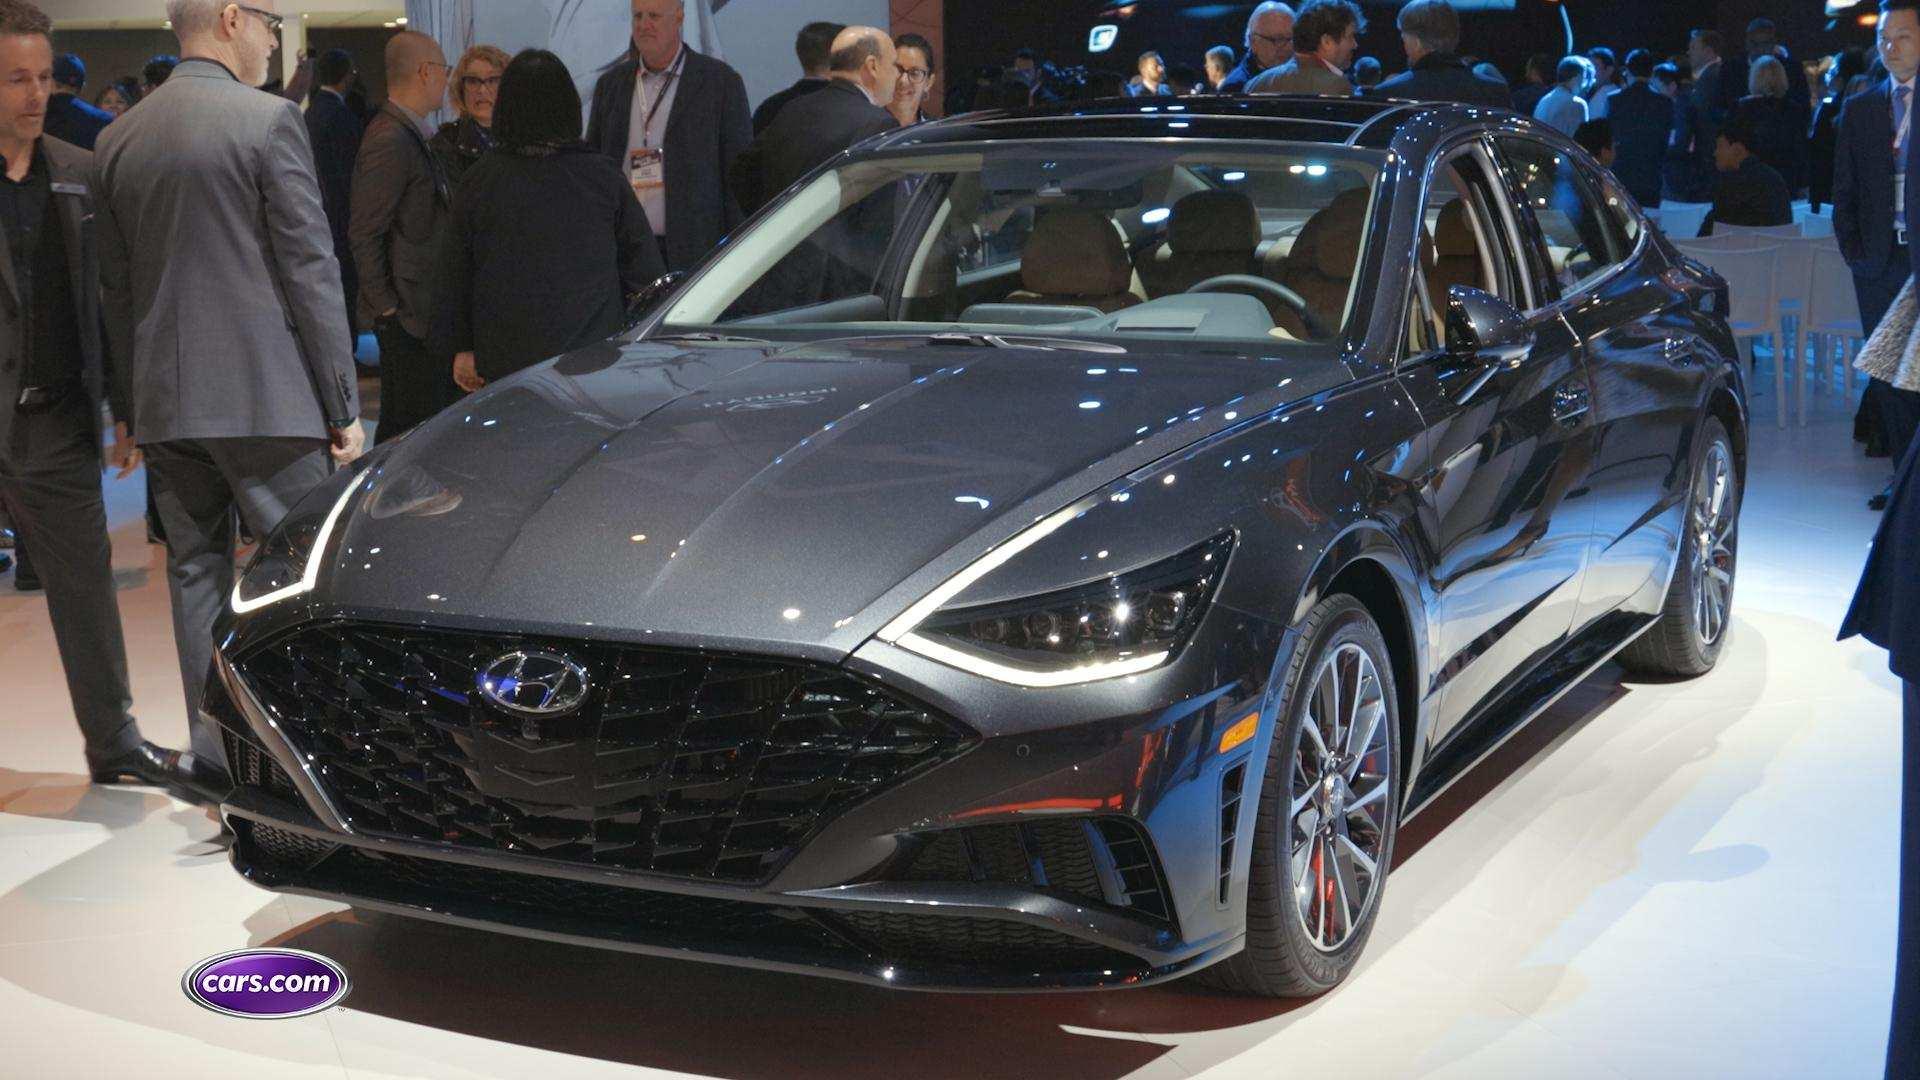 85 Best Review 2020 Hyundai Sonata Redesign Exterior by 2020 Hyundai Sonata Redesign